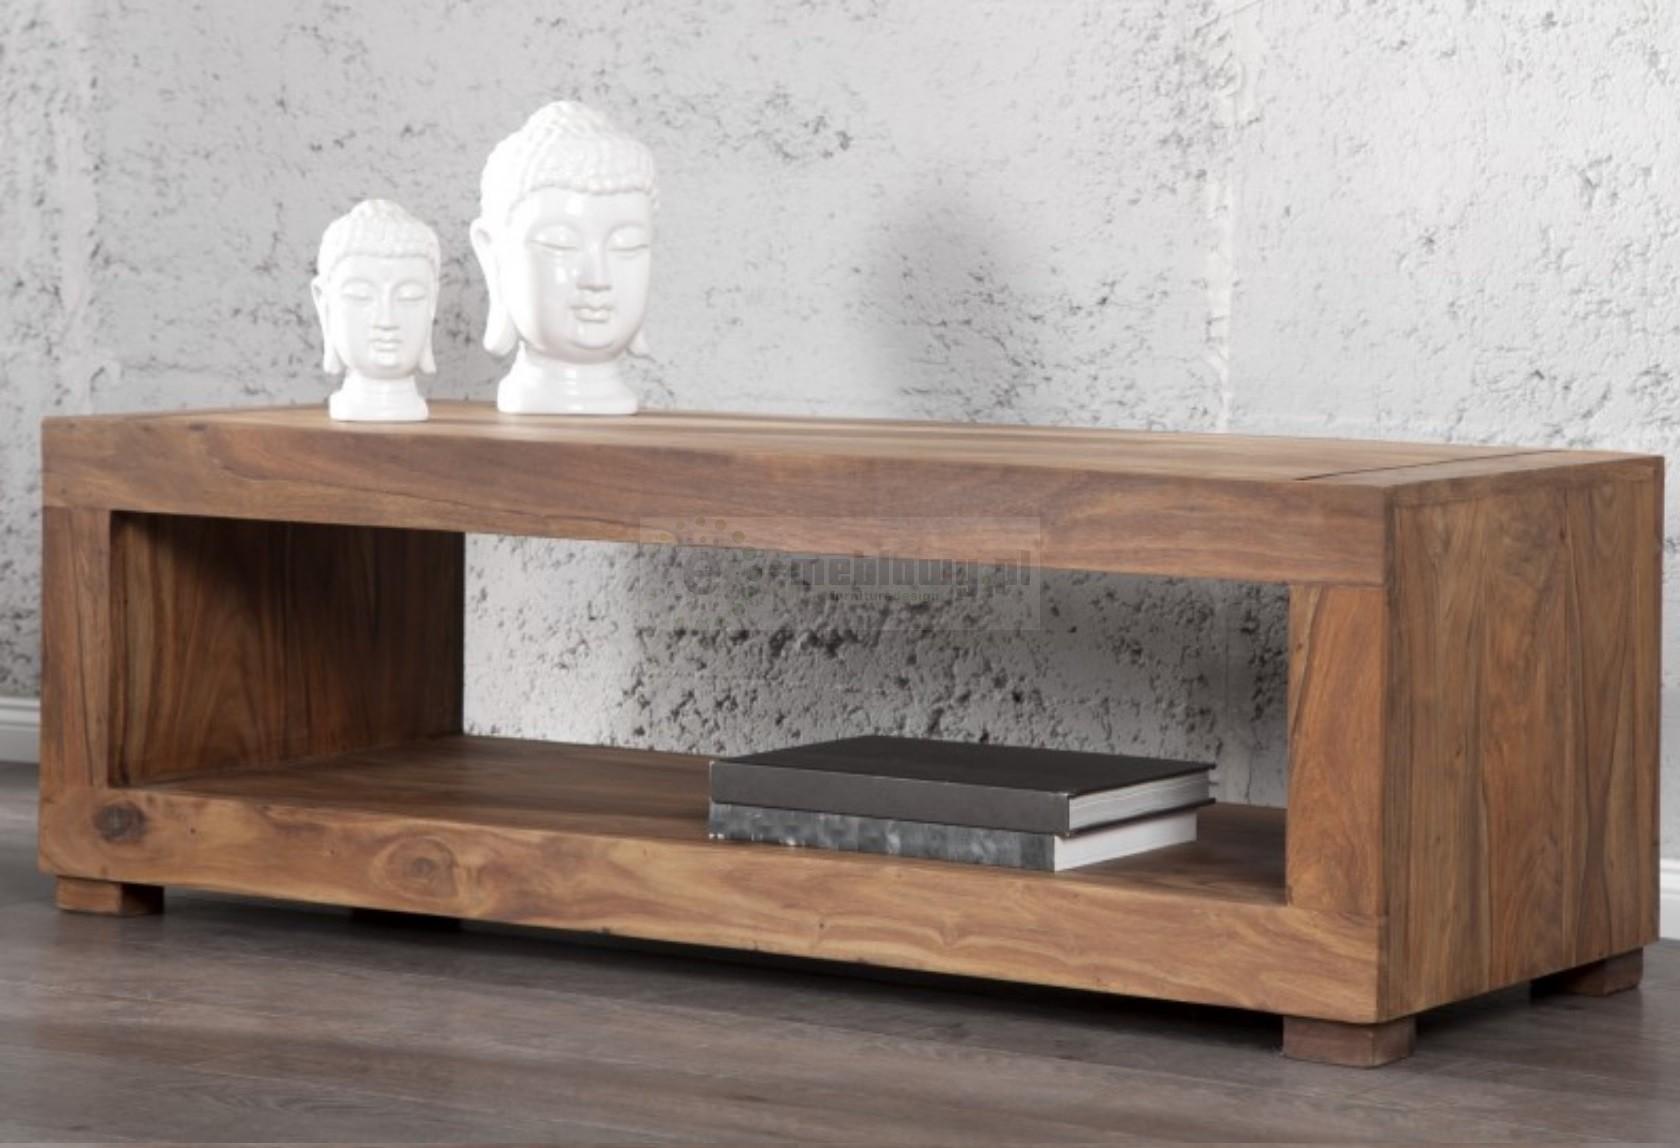 madera szafka rtv stolik pod telewizor szafka pod telewizor. Black Bedroom Furniture Sets. Home Design Ideas